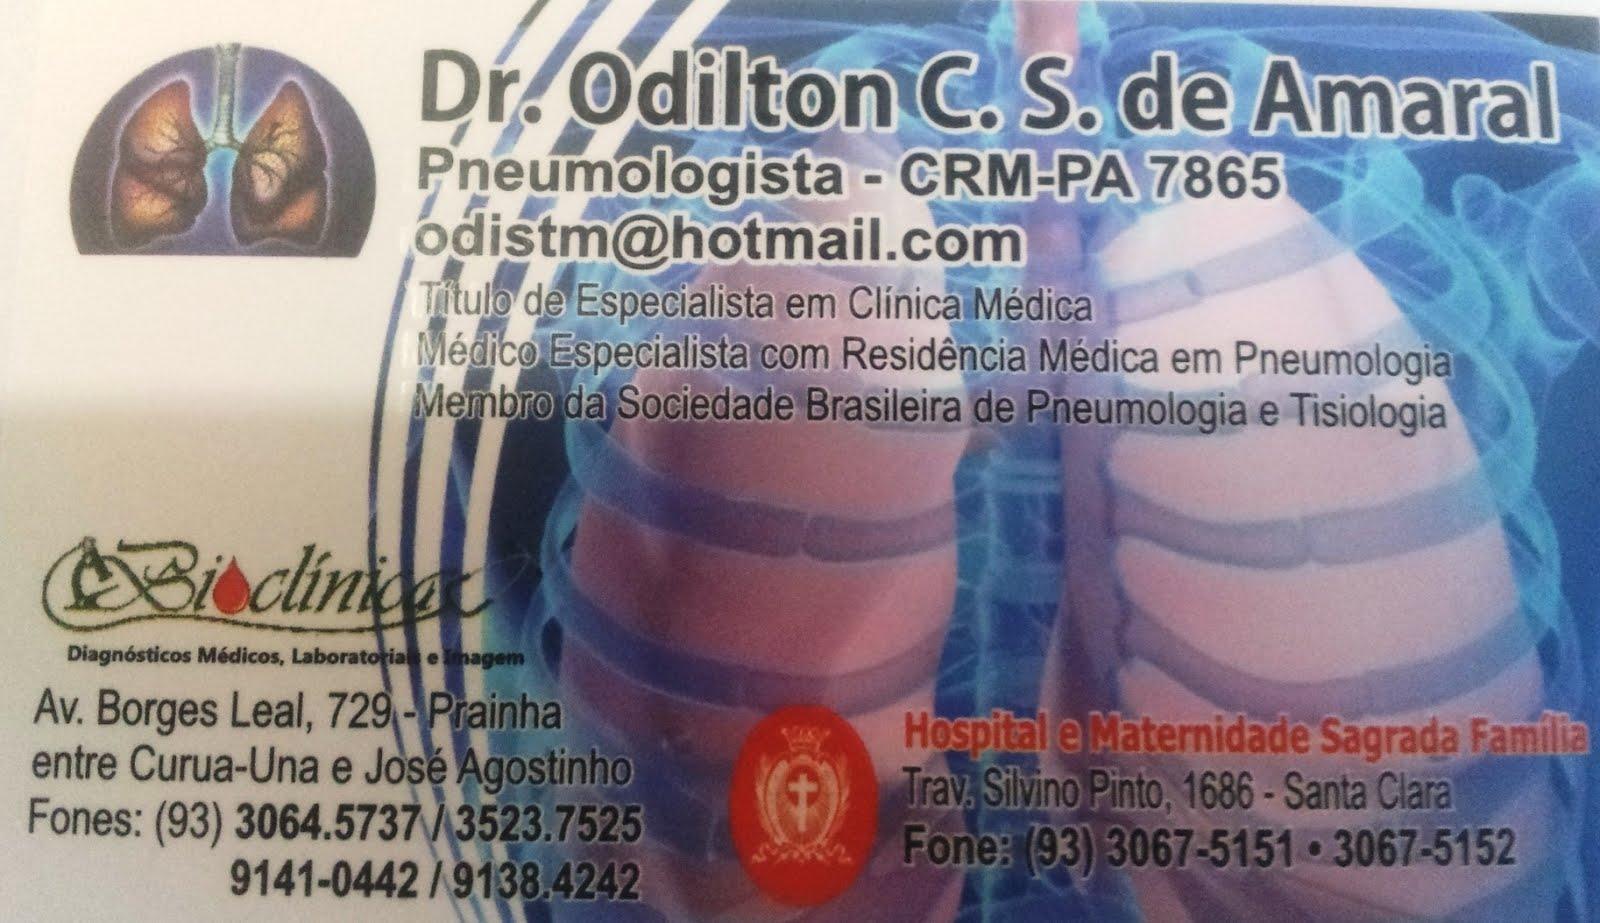 Dr. ODILTON AMARAL